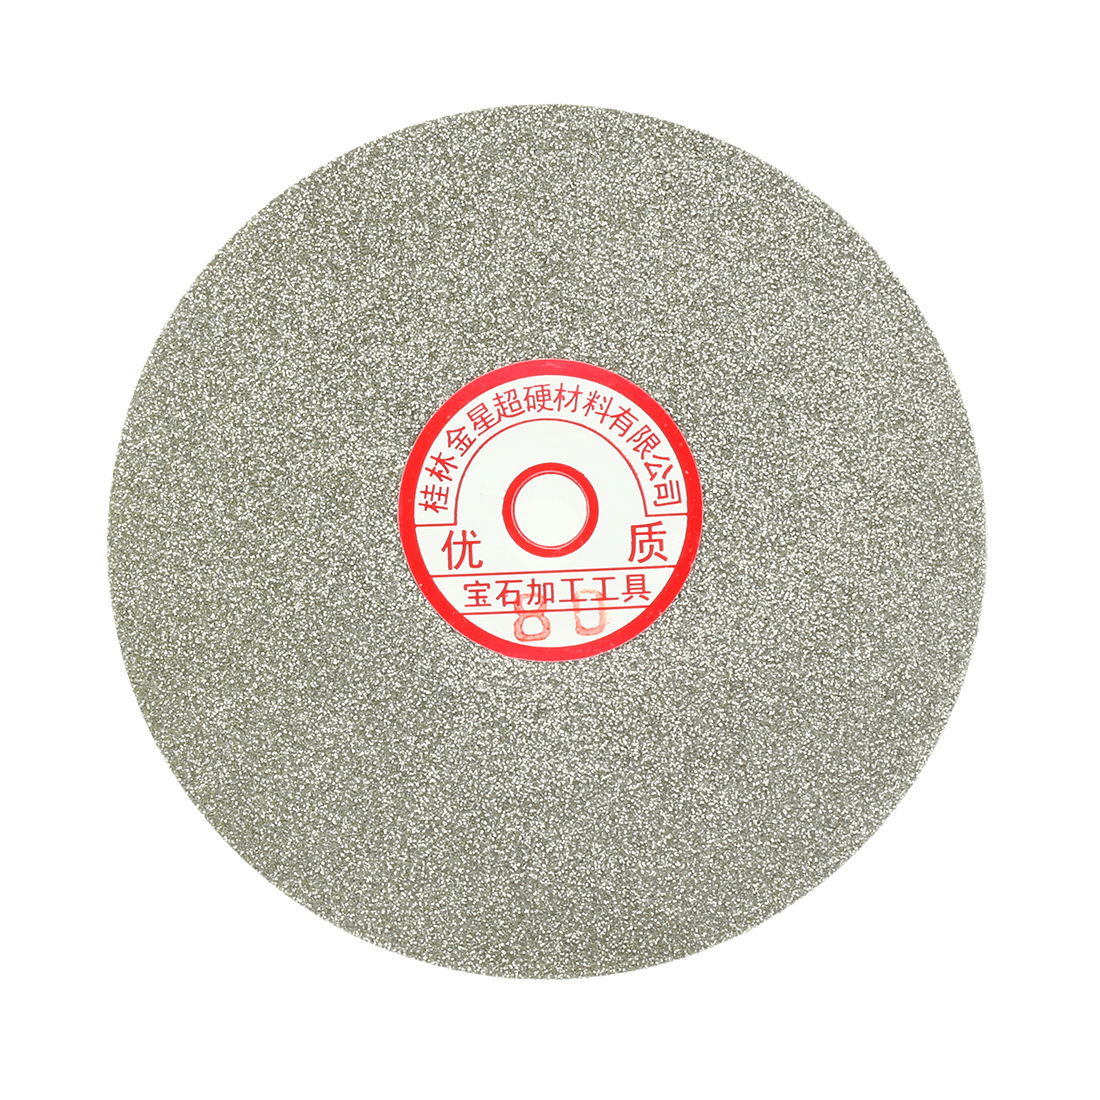 6-inch Grit 80 Diamond Coated Flat Lap Wheel Grinding Sanding Polishing Disc